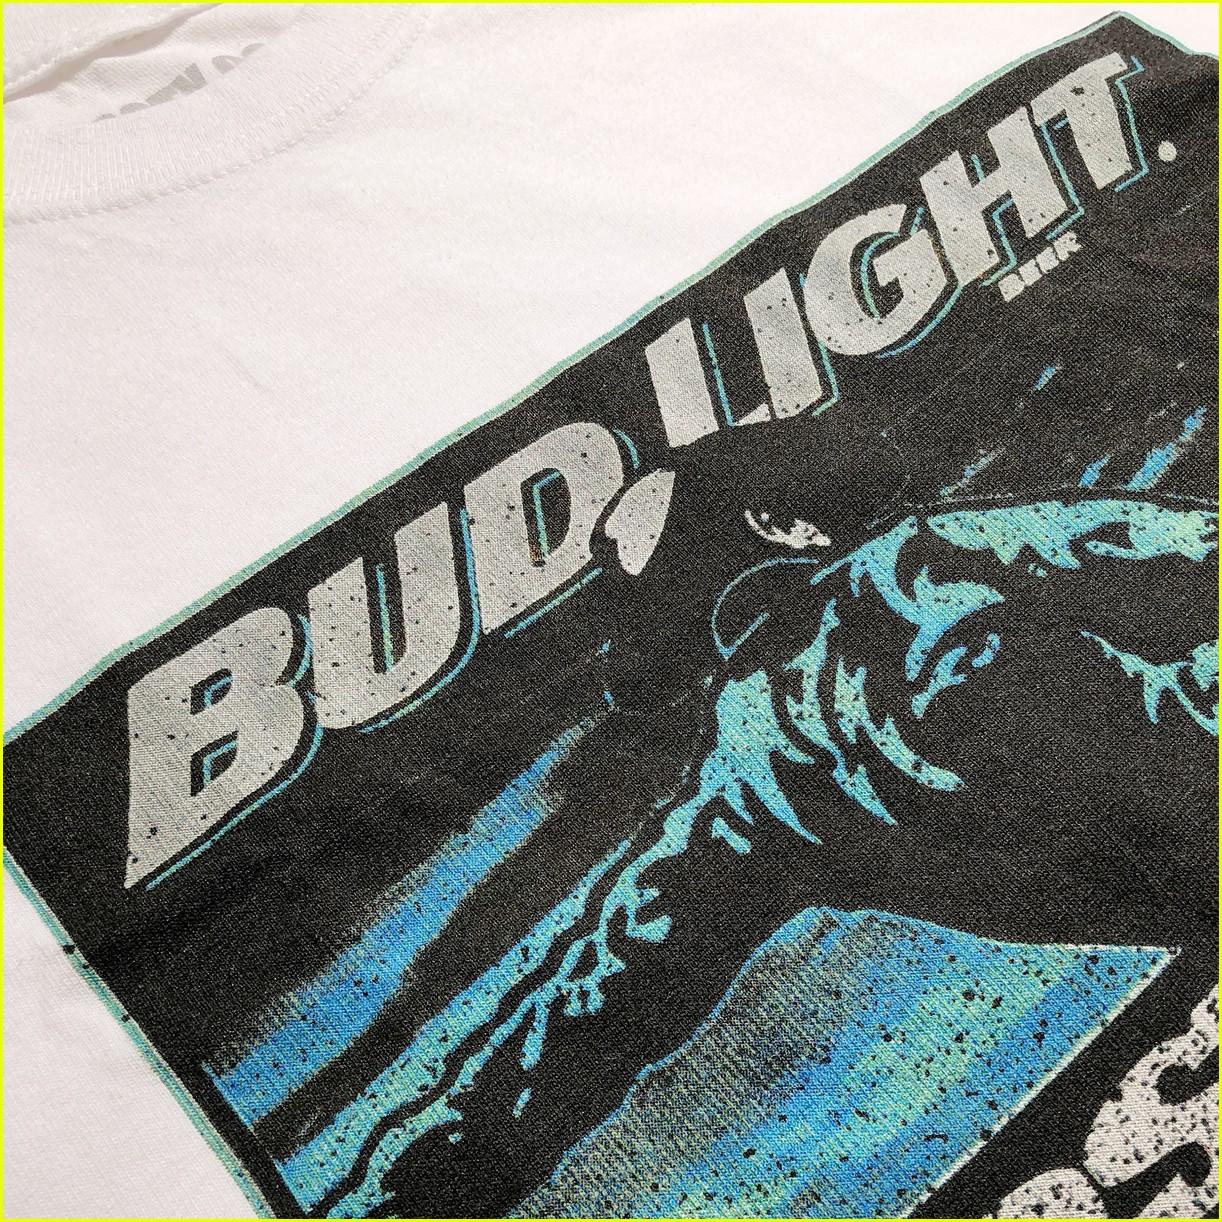 post malone bud light collab 18.